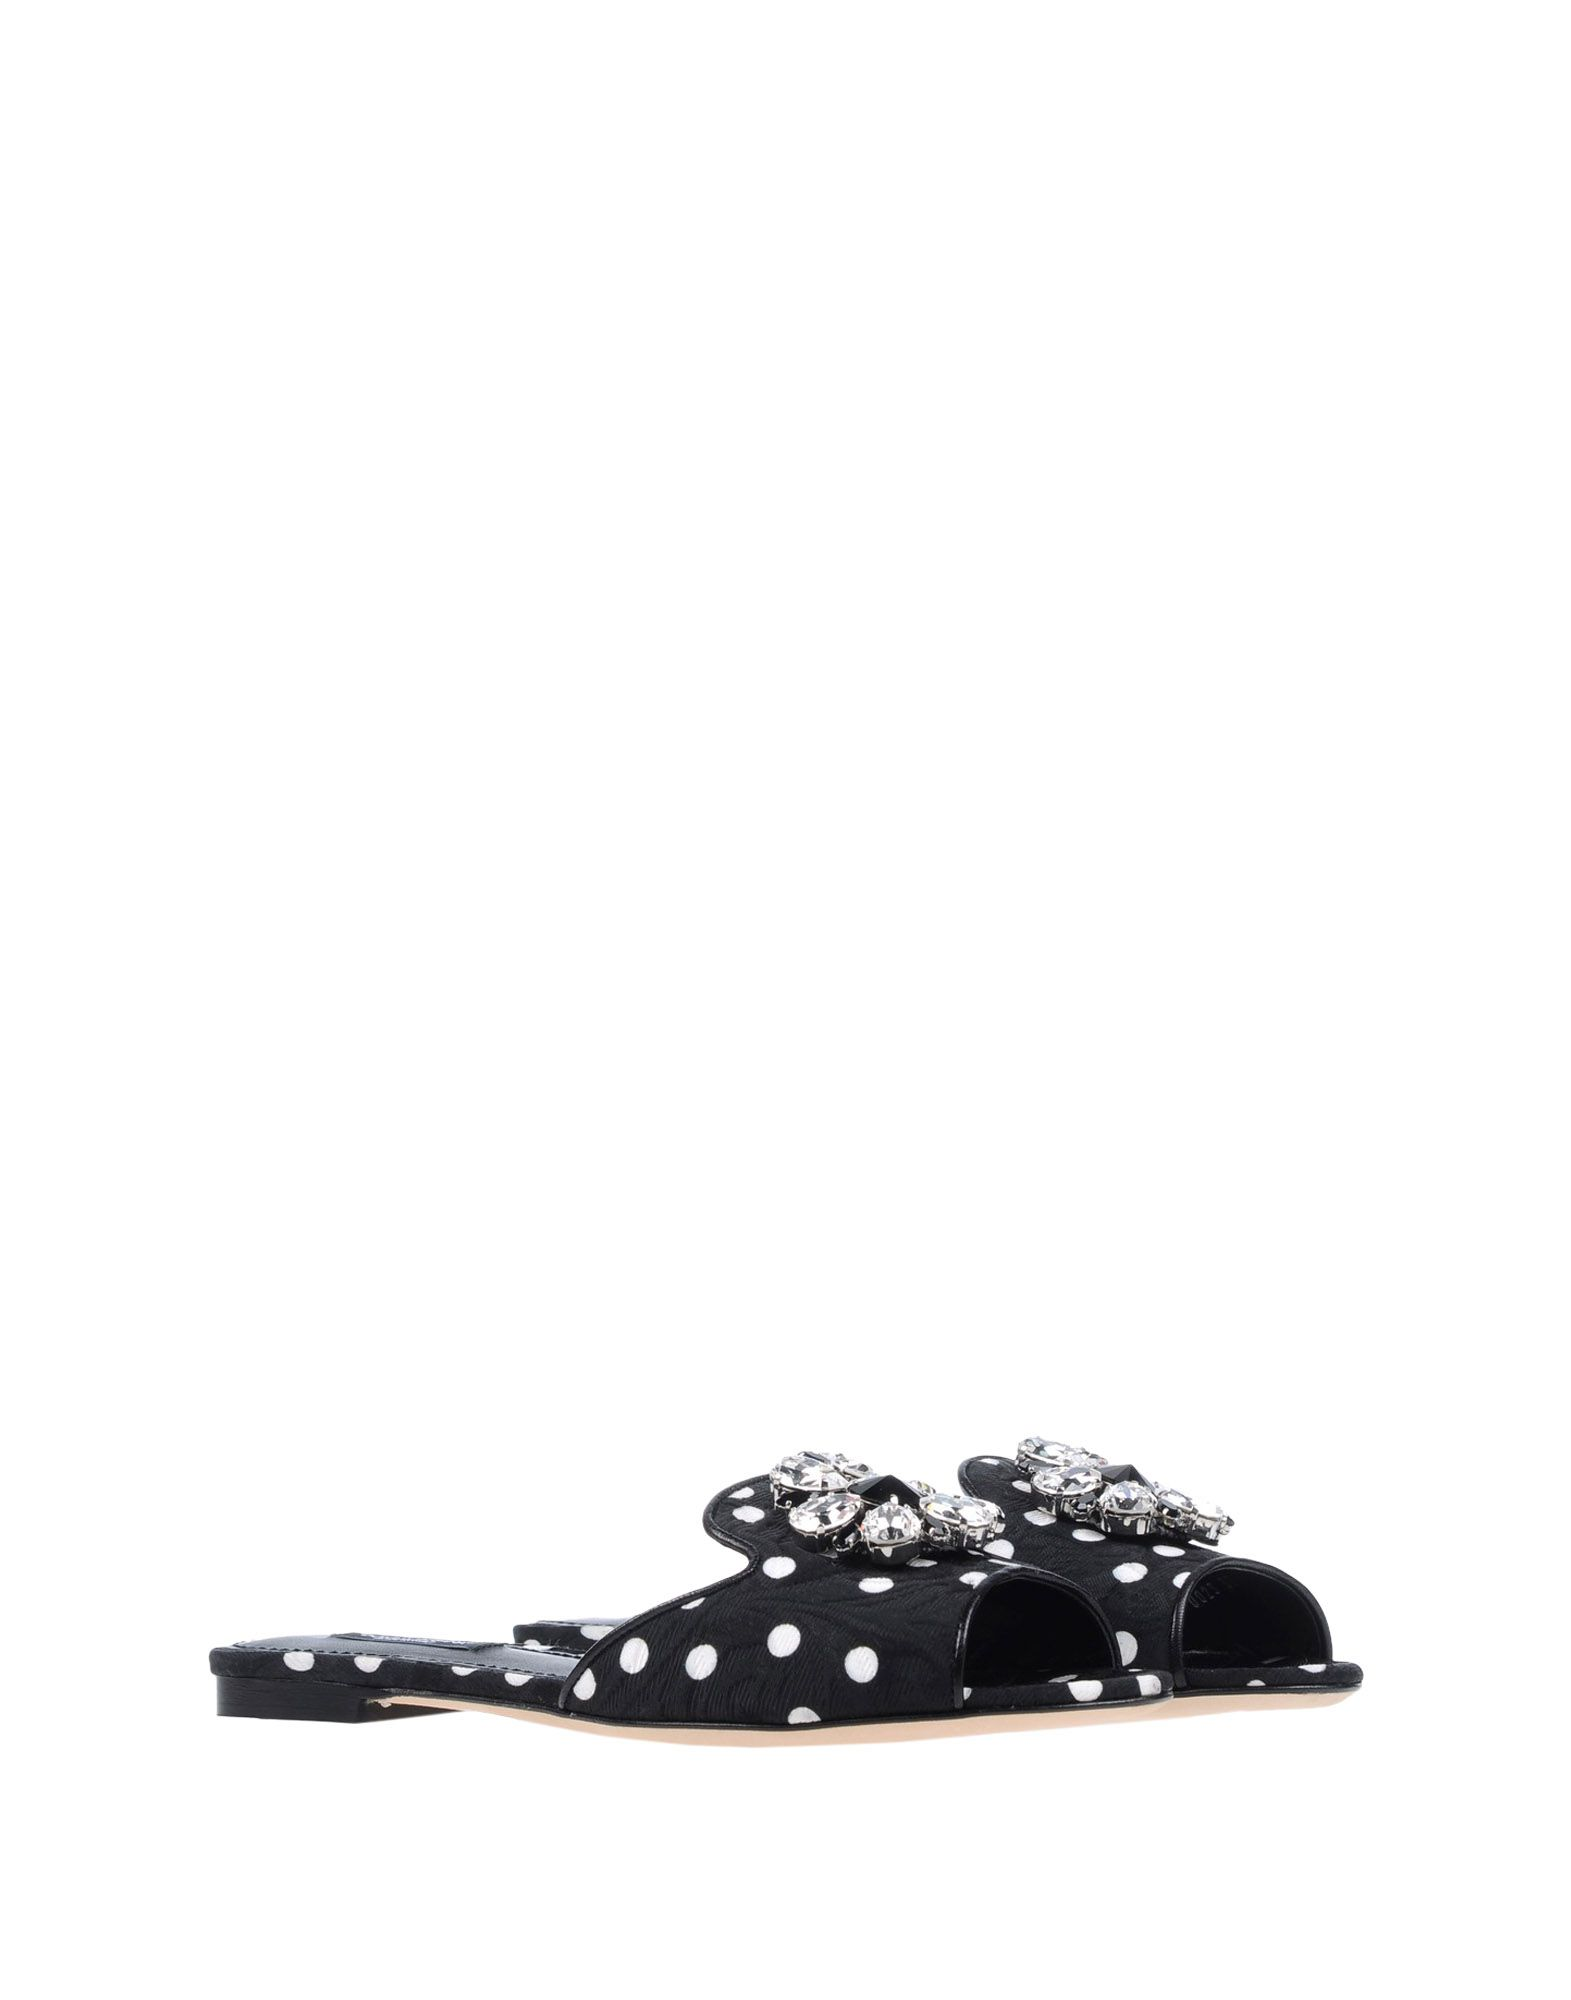 Dolce & & Dolce Gabbana Sandalen Damen  11327929BX Neue Schuhe 7bf762